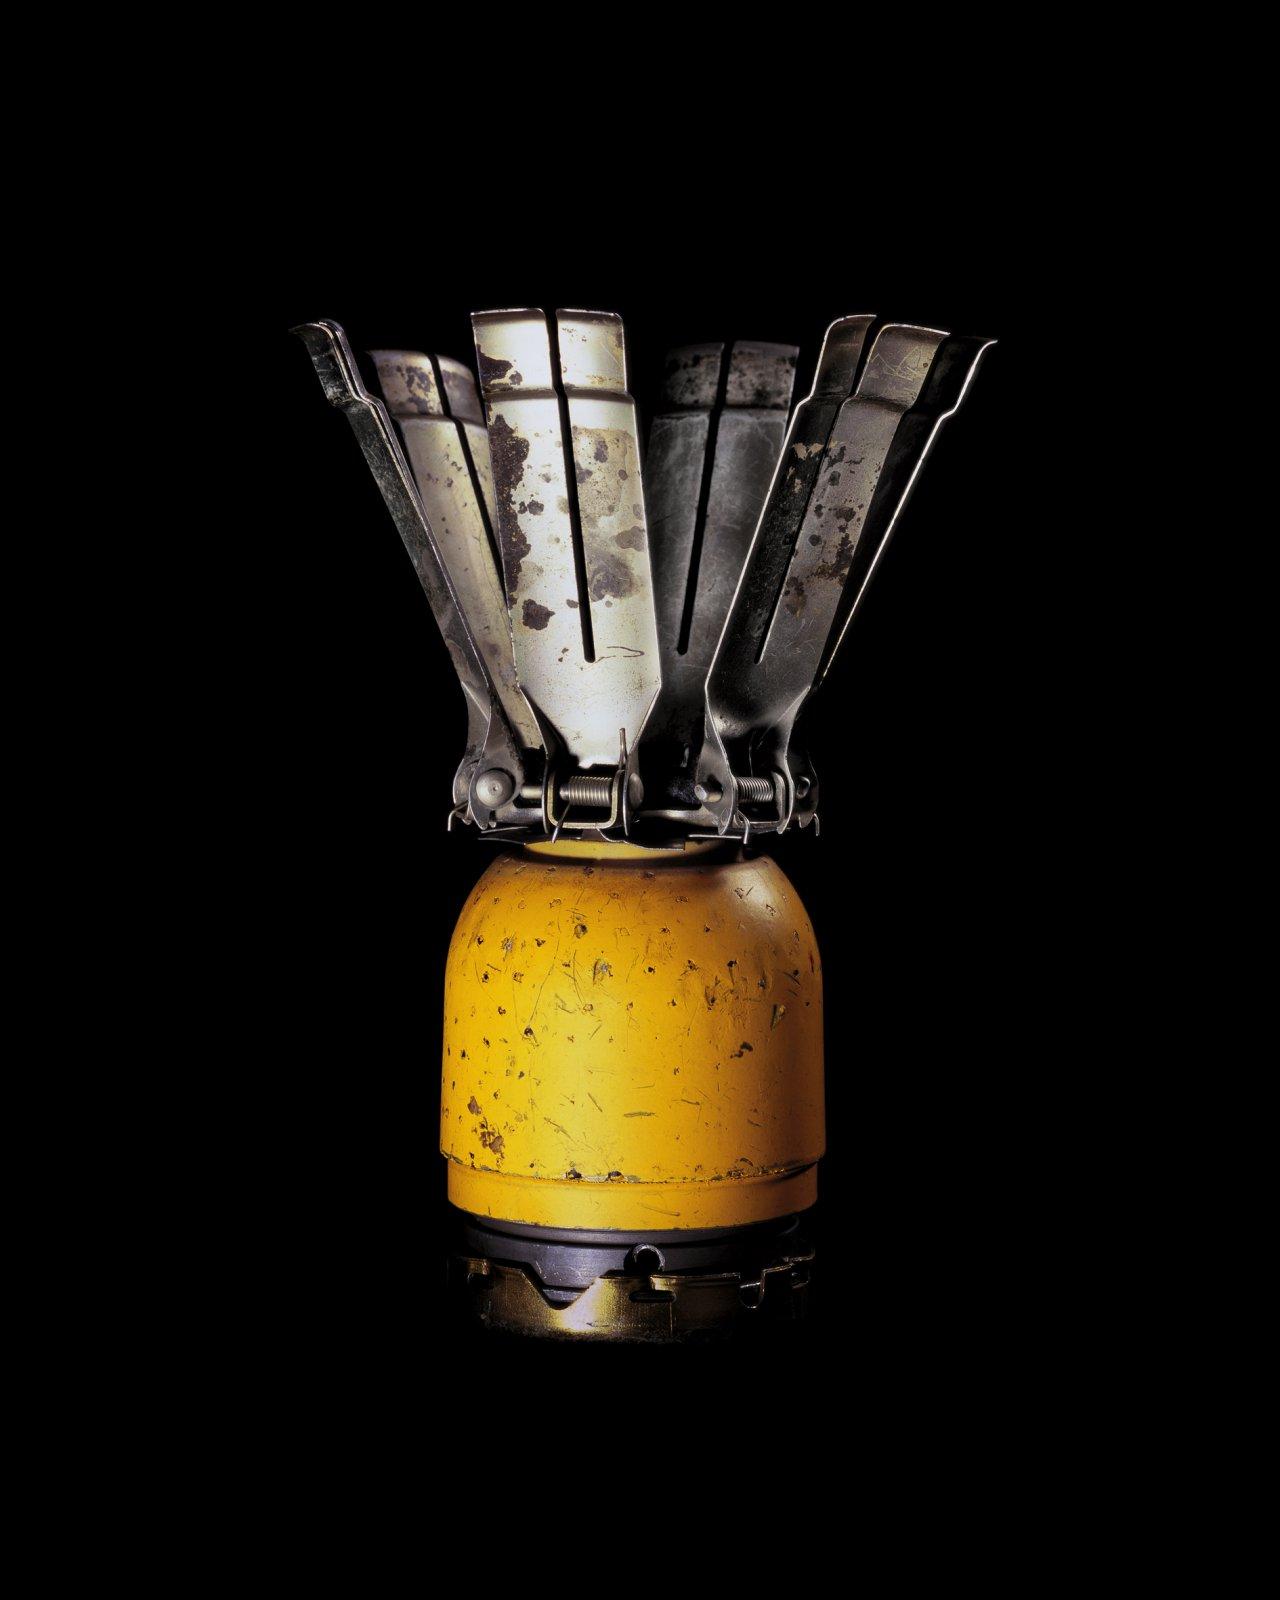 Antipersonel, Submition BLU-3B USA, 2004 © Raphael Dallaporta